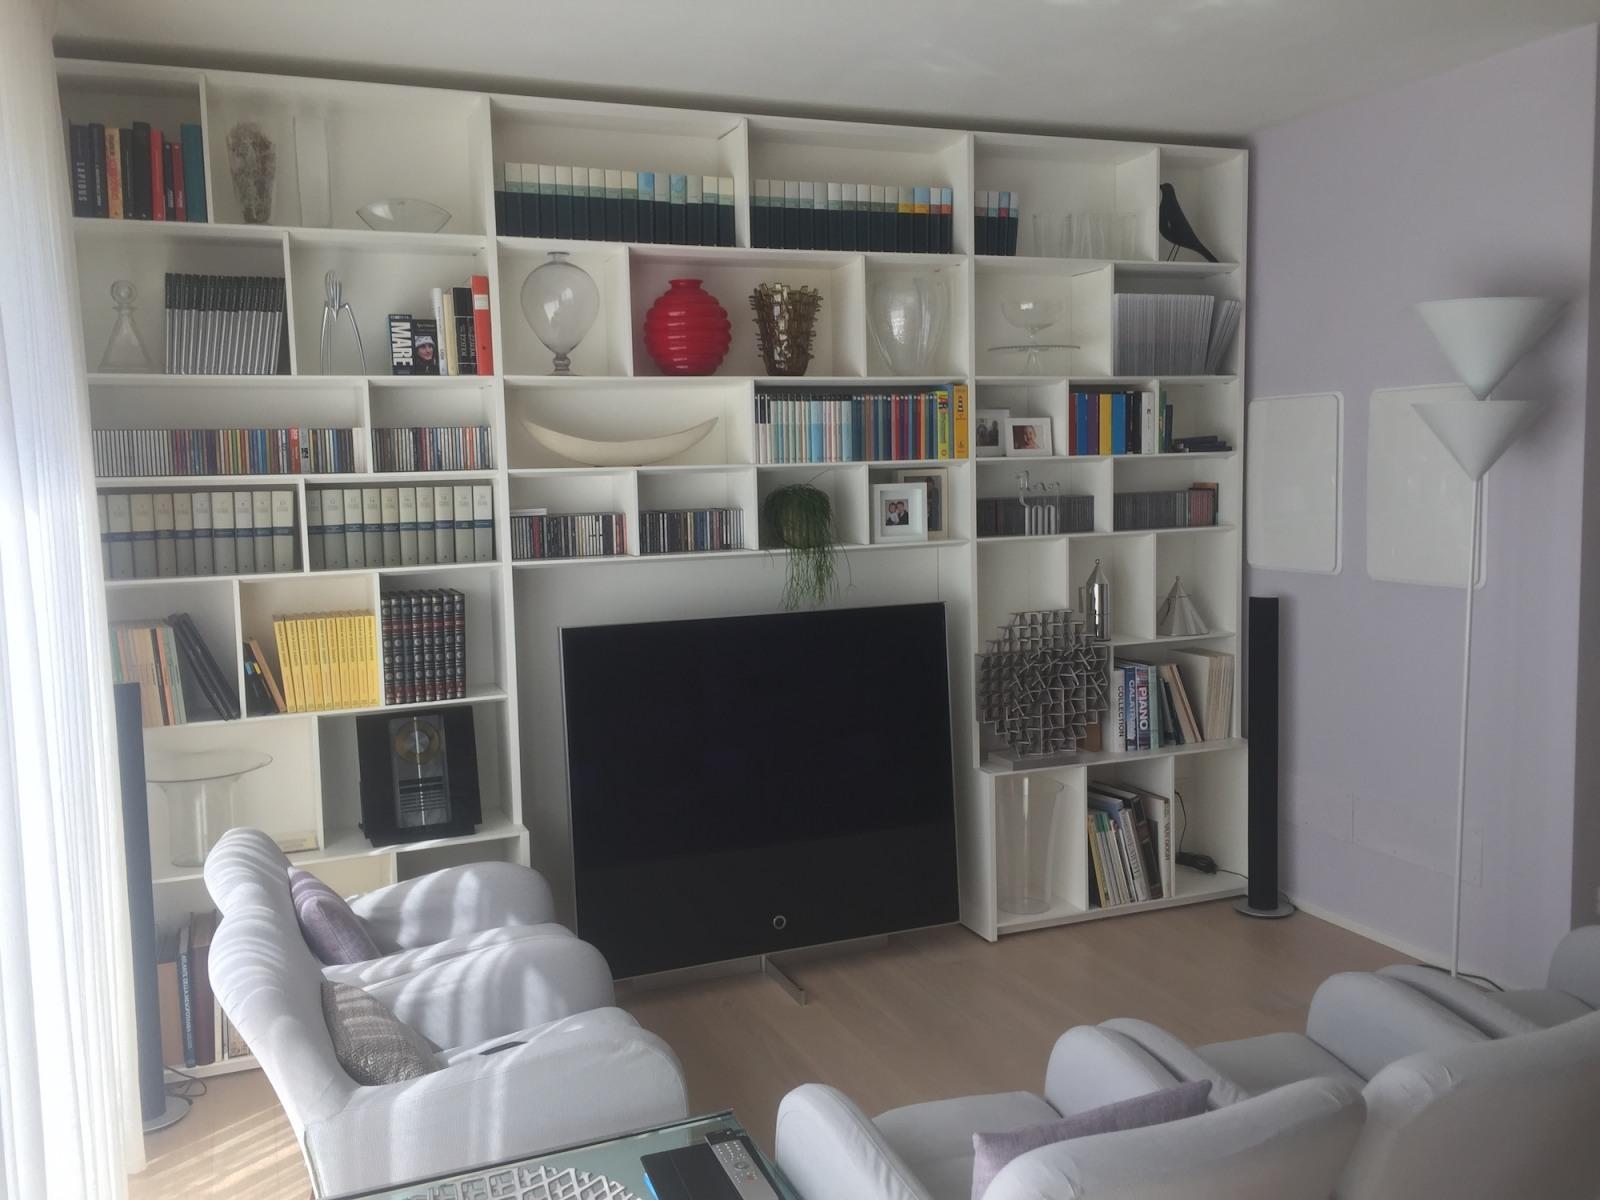 residence-leonardi-da-vinci-costabissara-vicenza-3